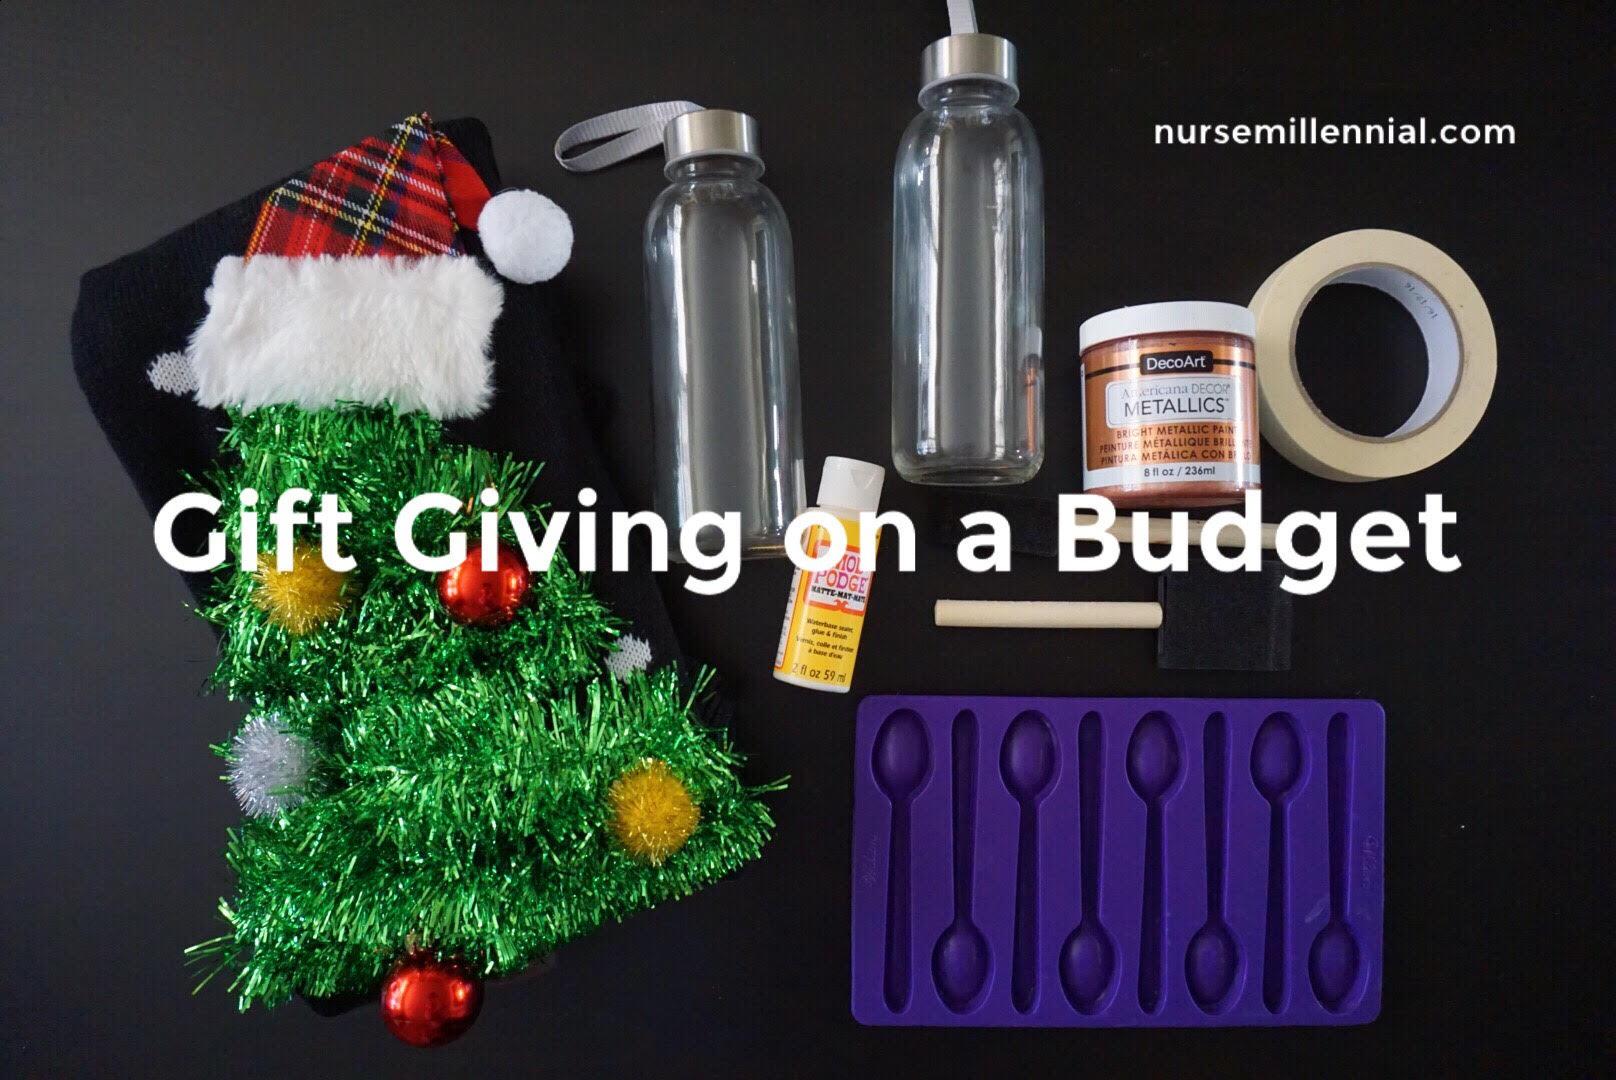 Gift Giving on a Budget | nurse millennial